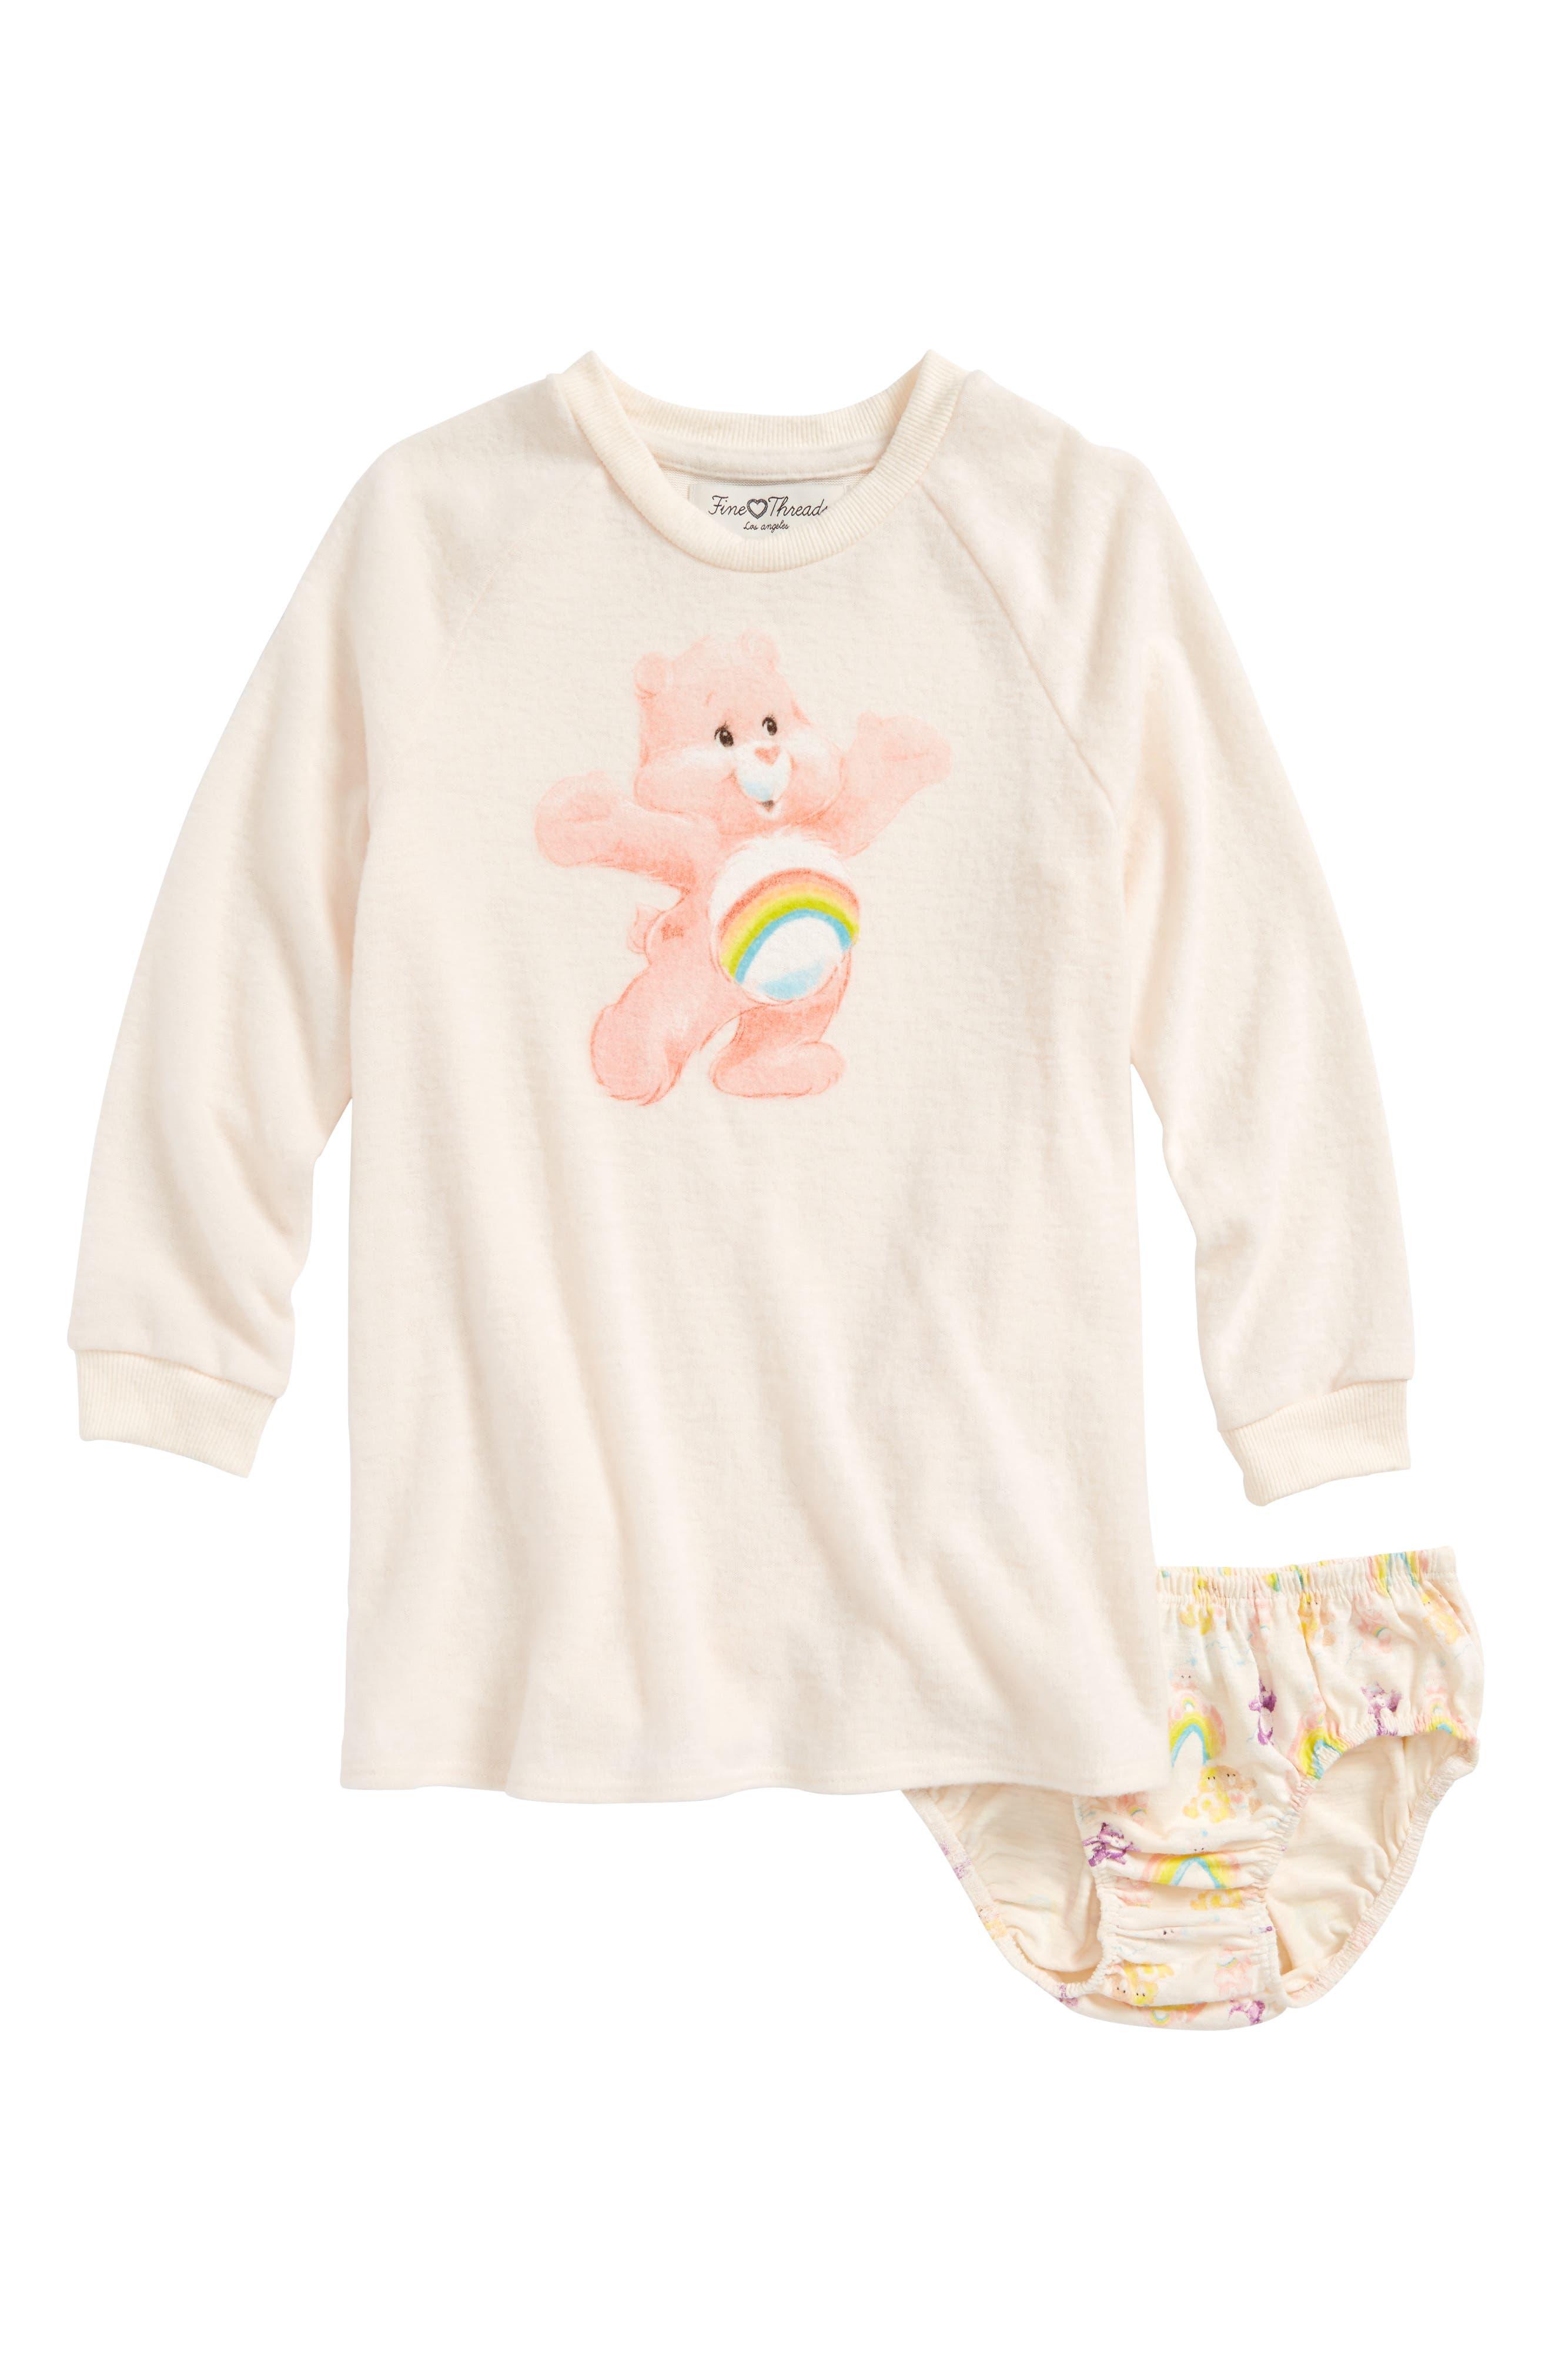 Main Image - Care Bears™ by Fine Threads Cheer Bear Dress (Toddler Girls & Little Girls)